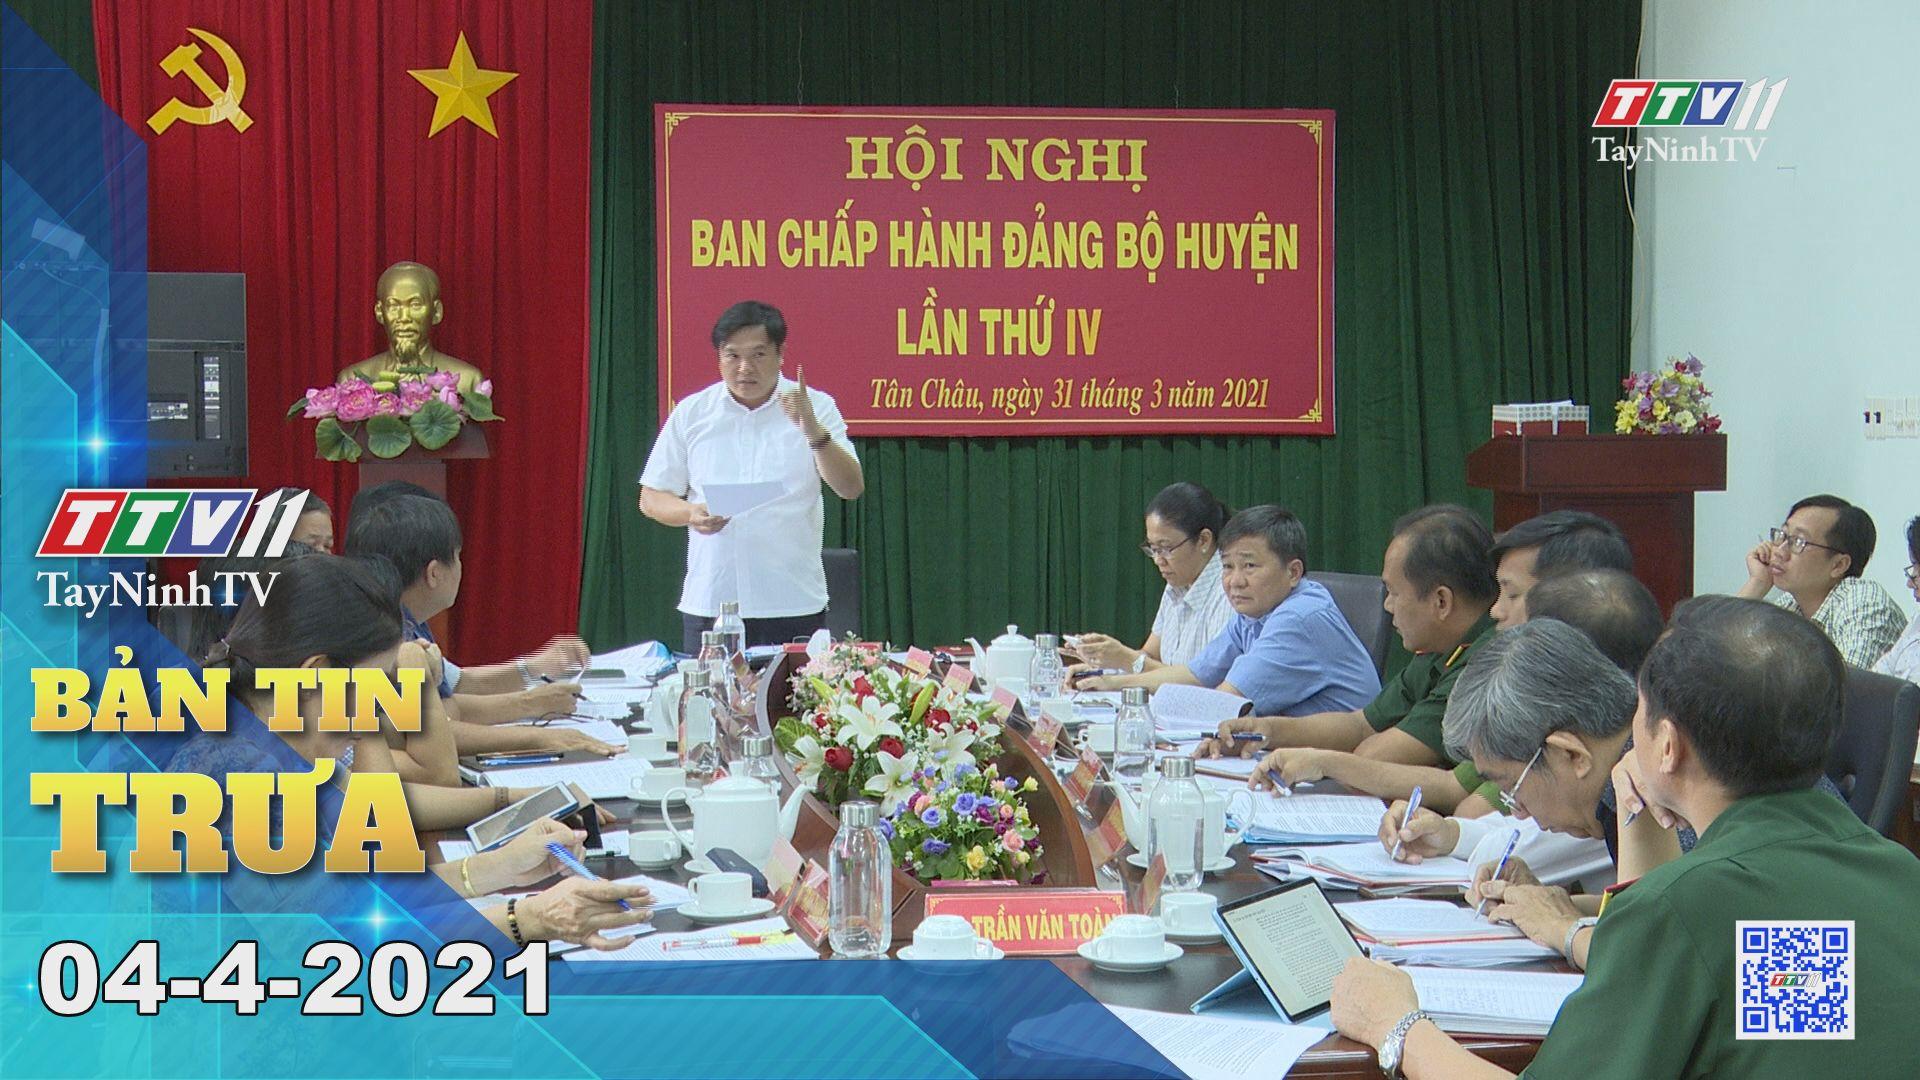 Bản tin trưa 04-4-2021 | Tin tức hôm nay | TayNinhTV